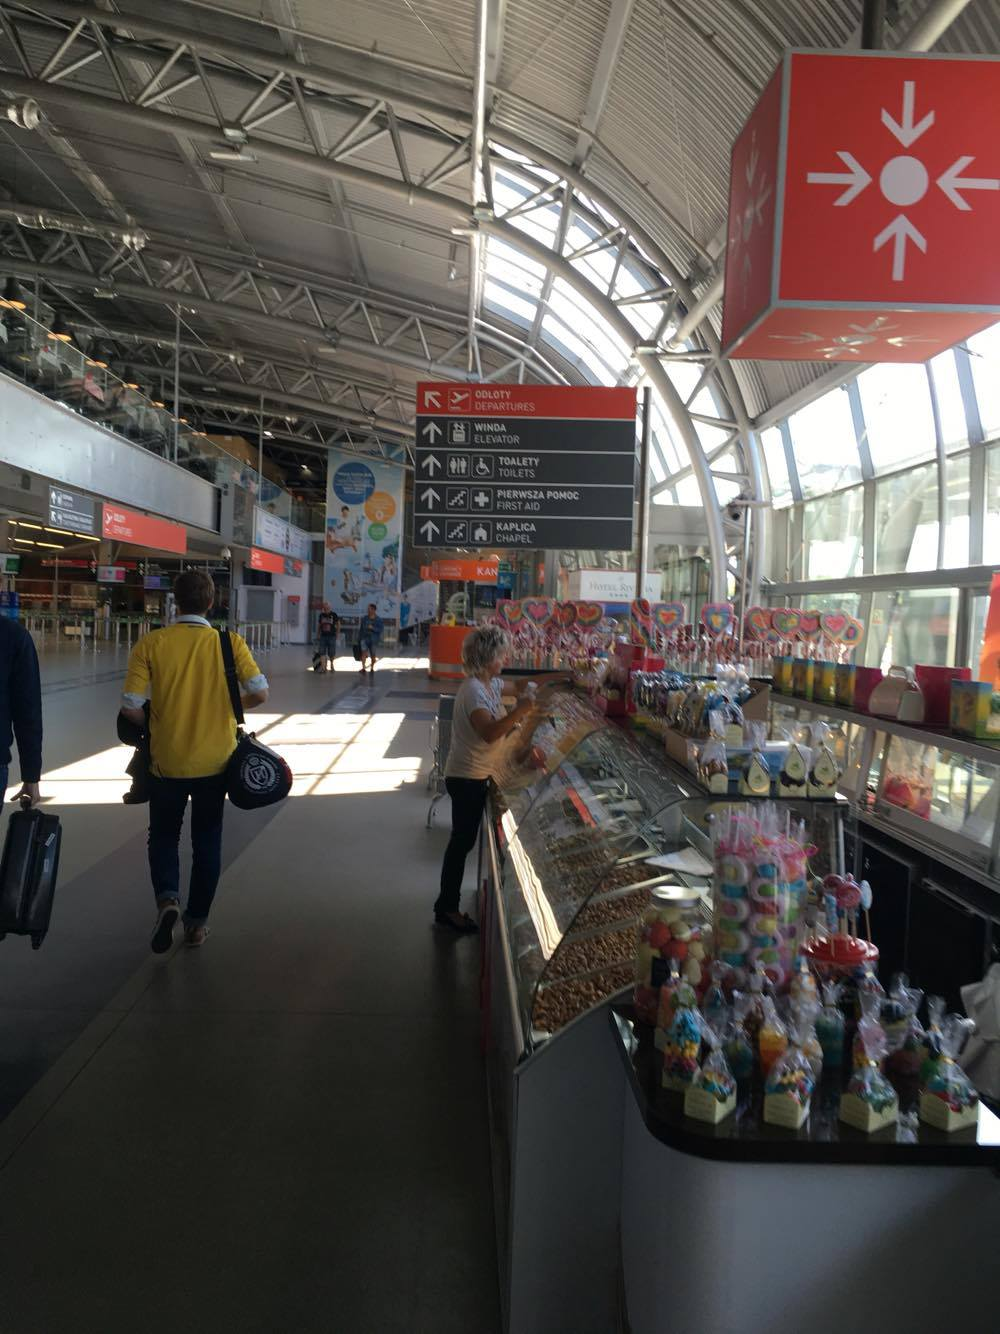 warszaw airport